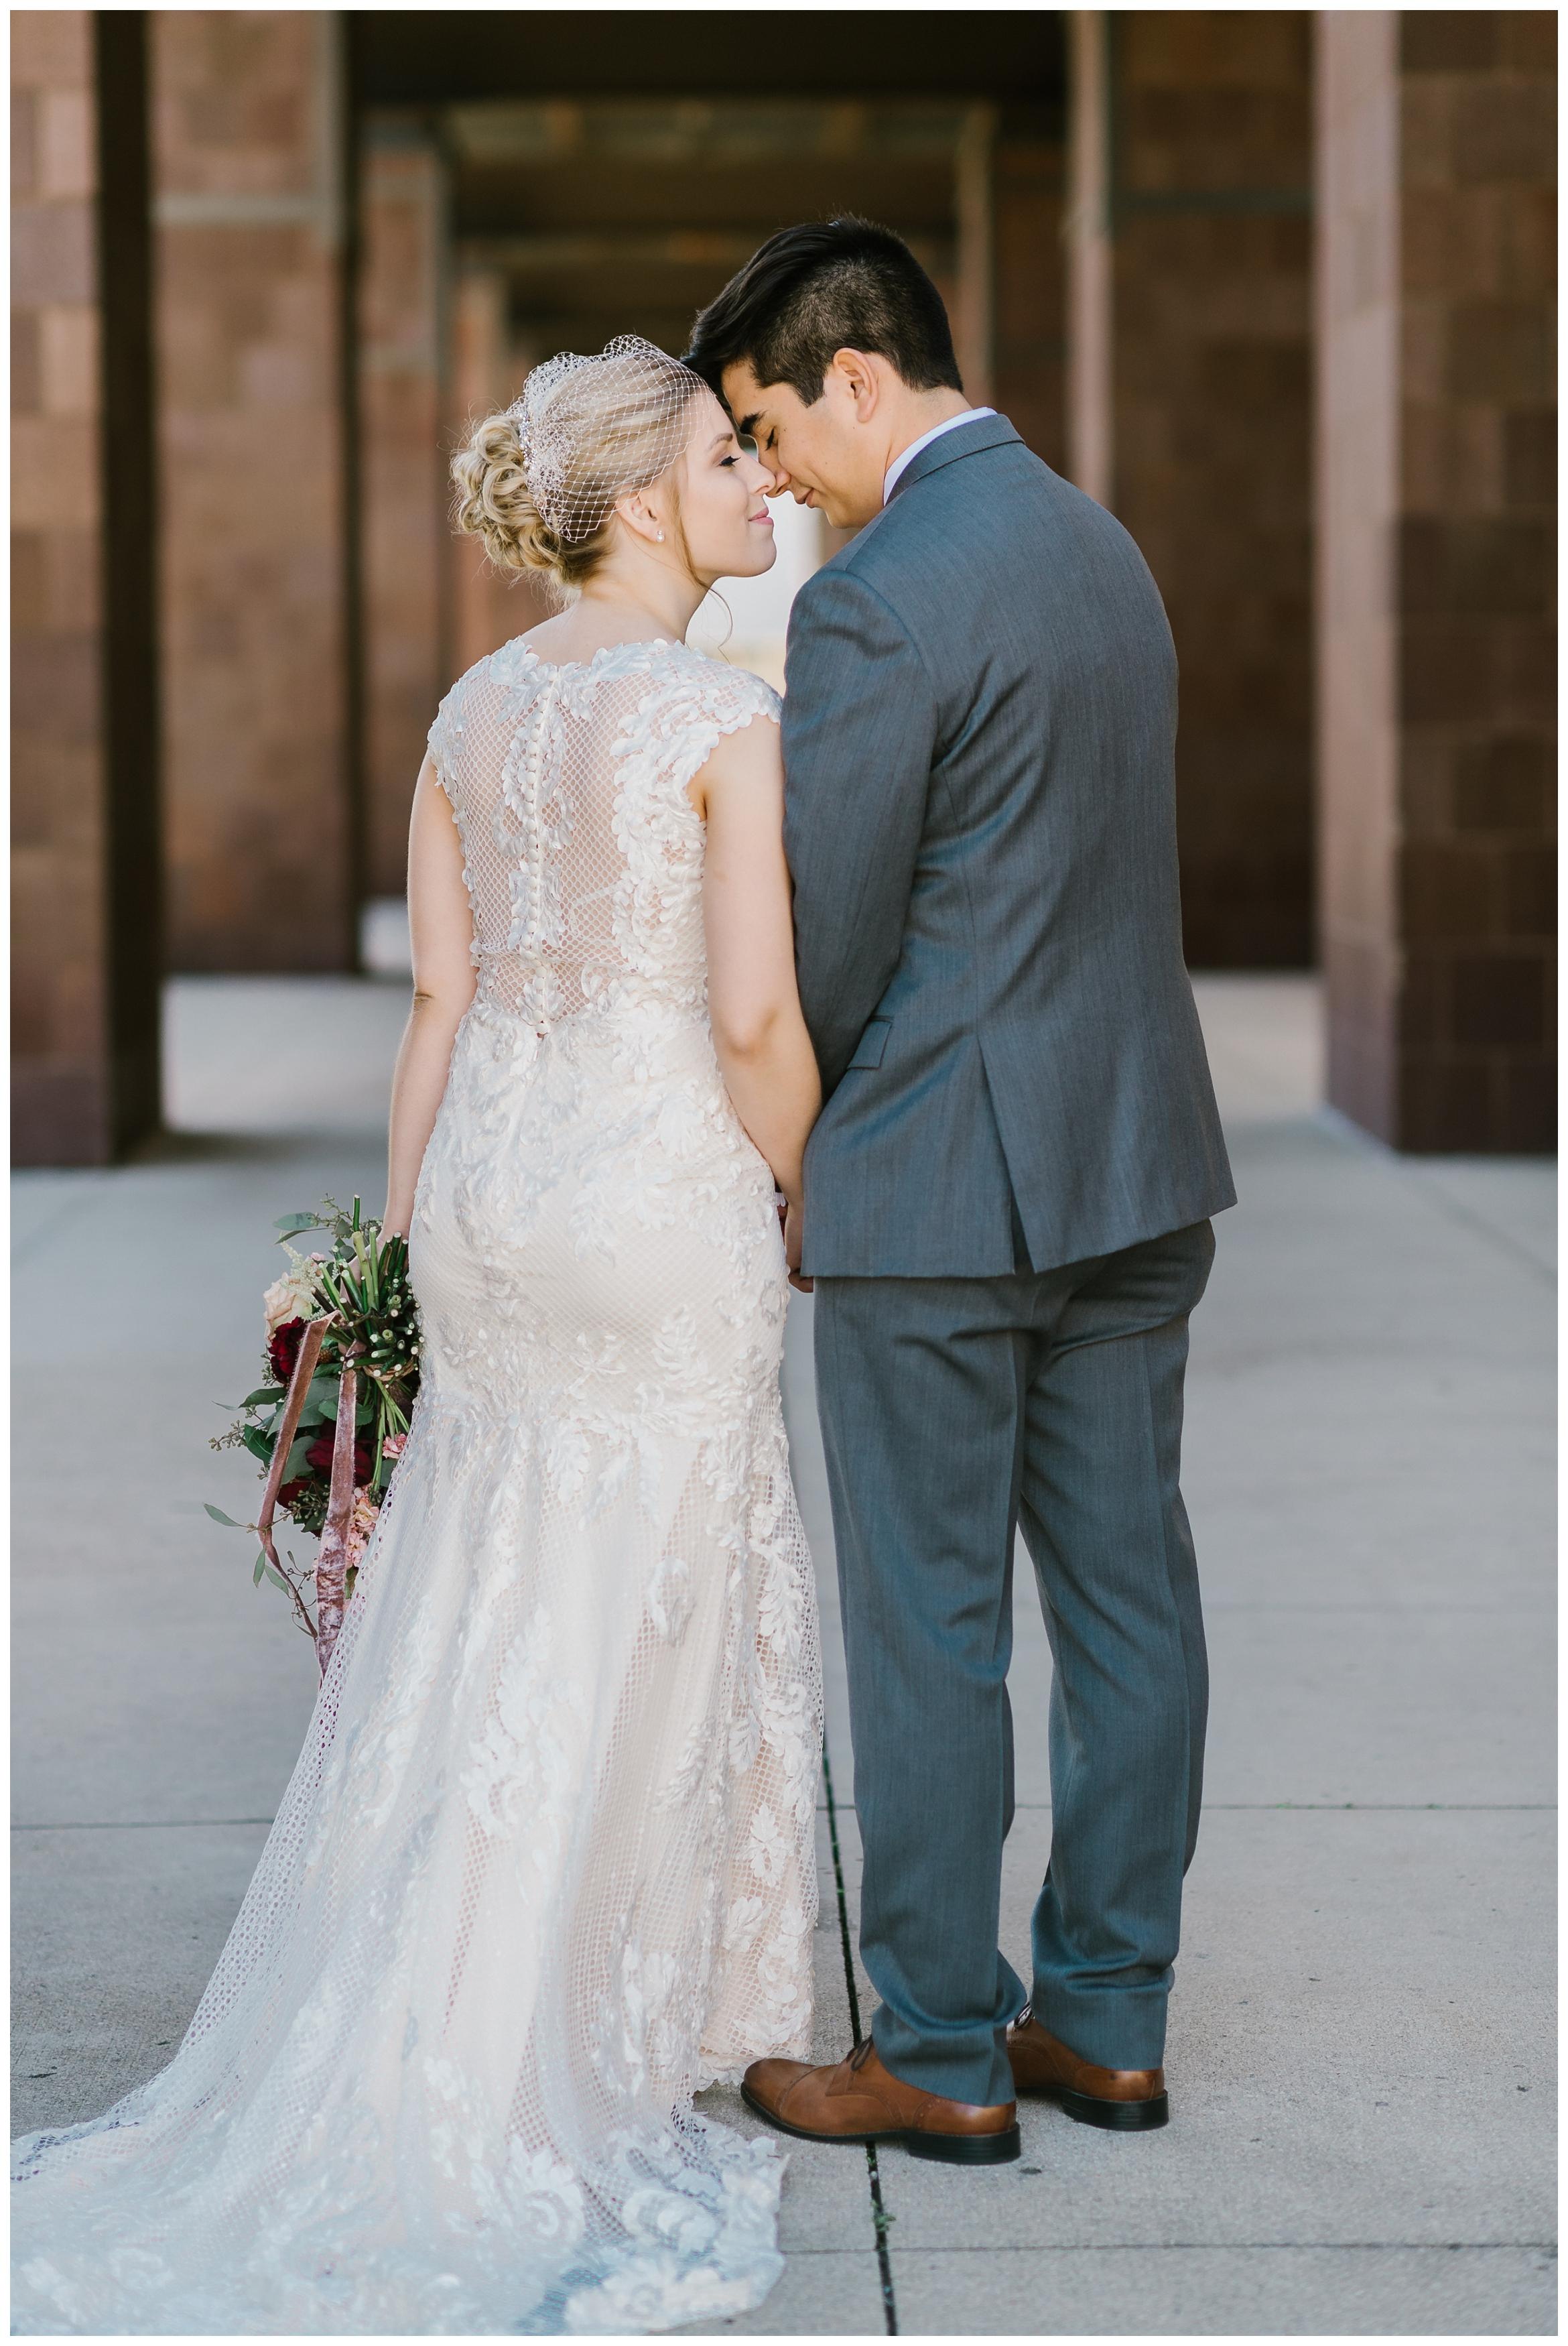 Rebecca_Shehorn_Photography_Indianapolis_Wedding_Photographer_7337.jpg